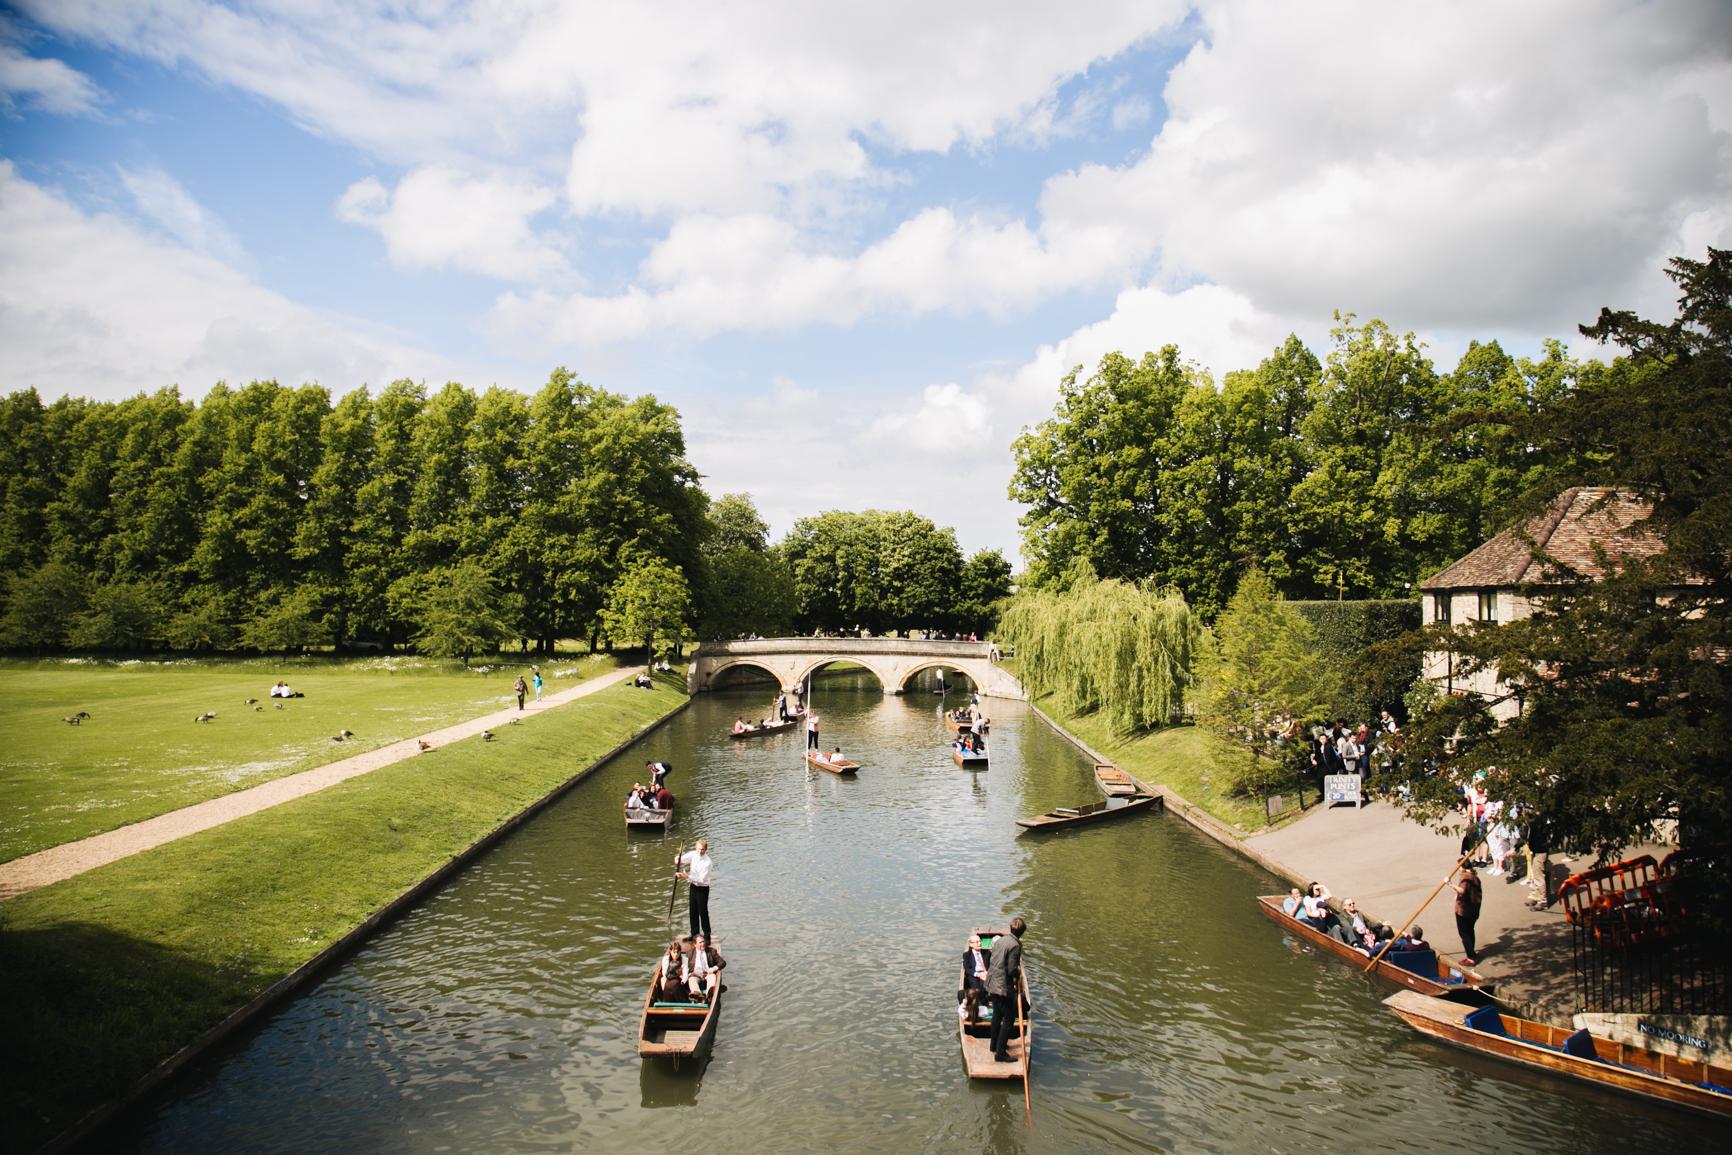 Punting-in-Cambridge-blog-voyage-onmyway.jpg